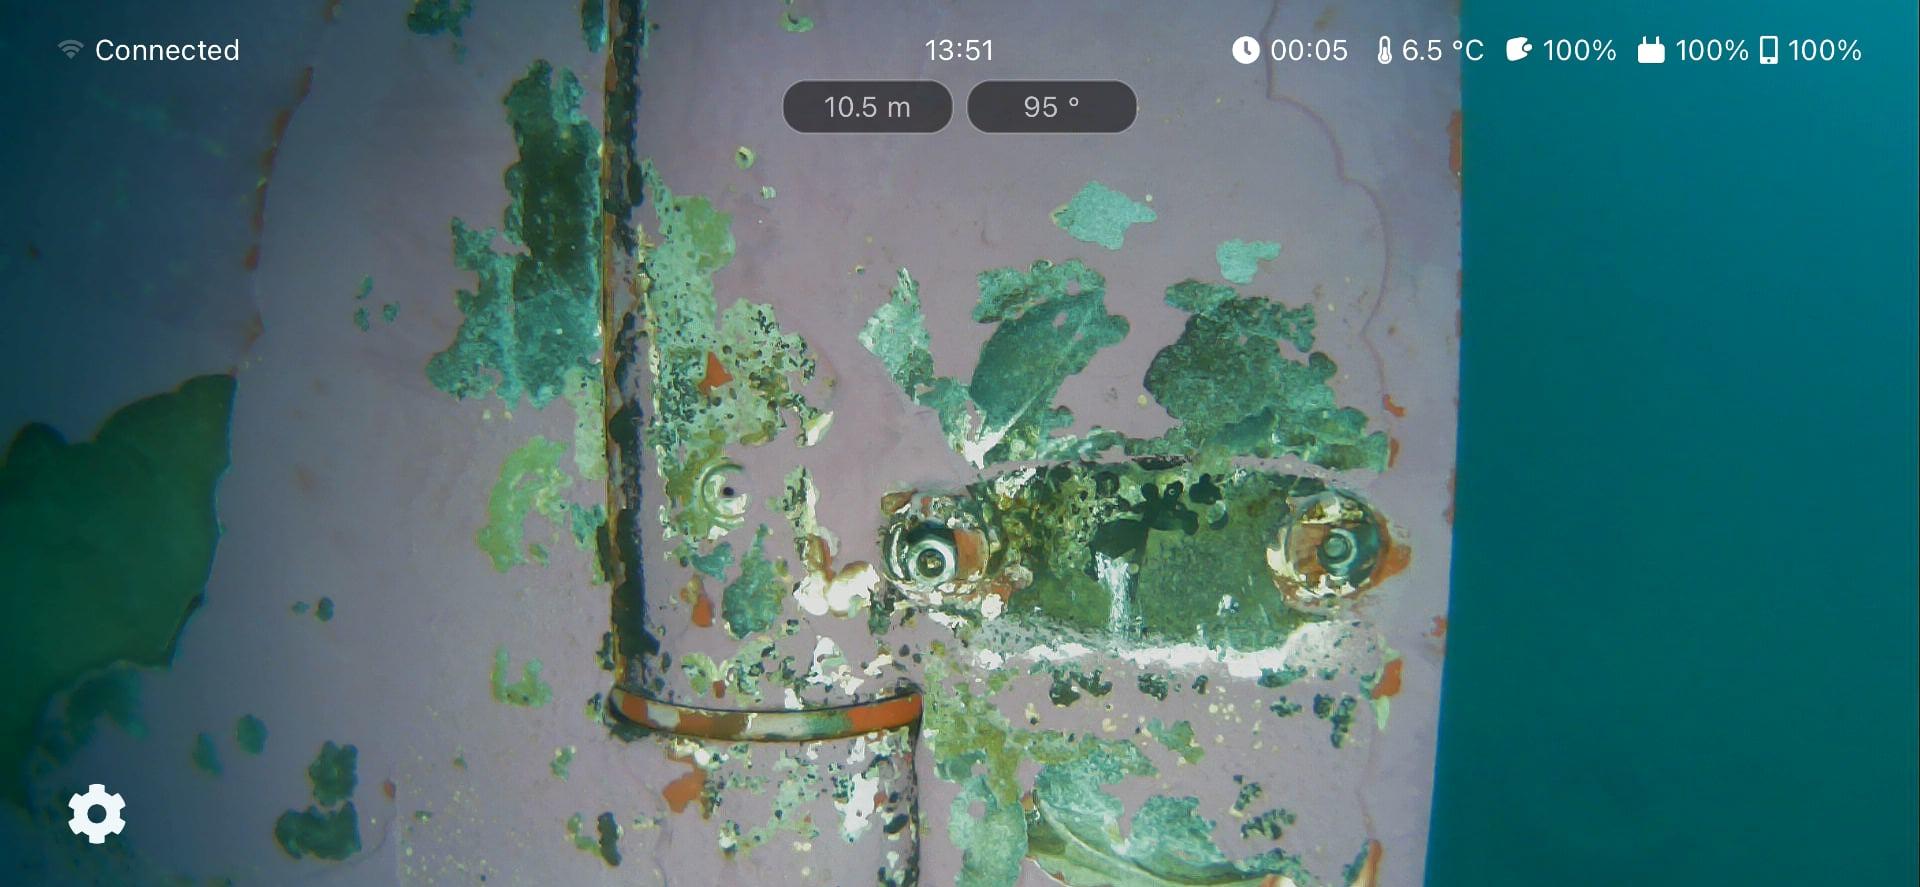 Blueye Observer app inspecting a damaged rudder